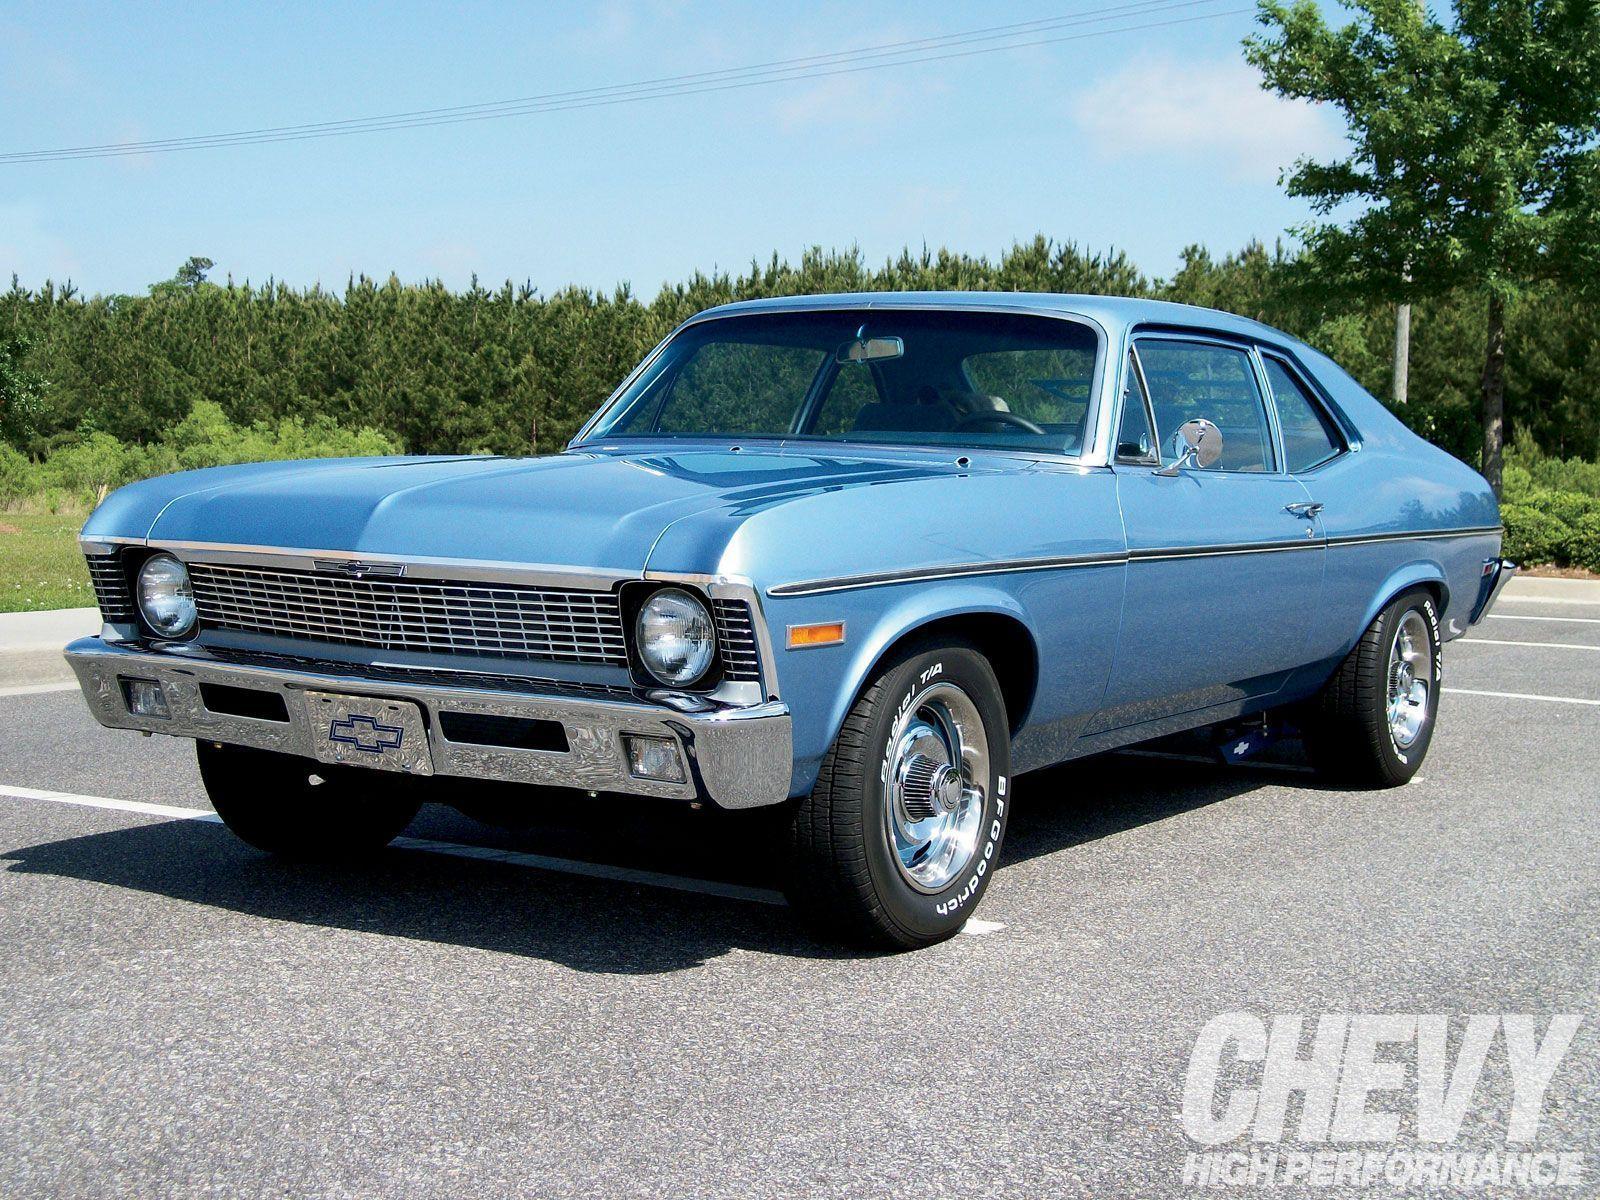 1970 Chevrolet Nova Chevy Nova Muscle Cars For Sale Chevrolet Nova